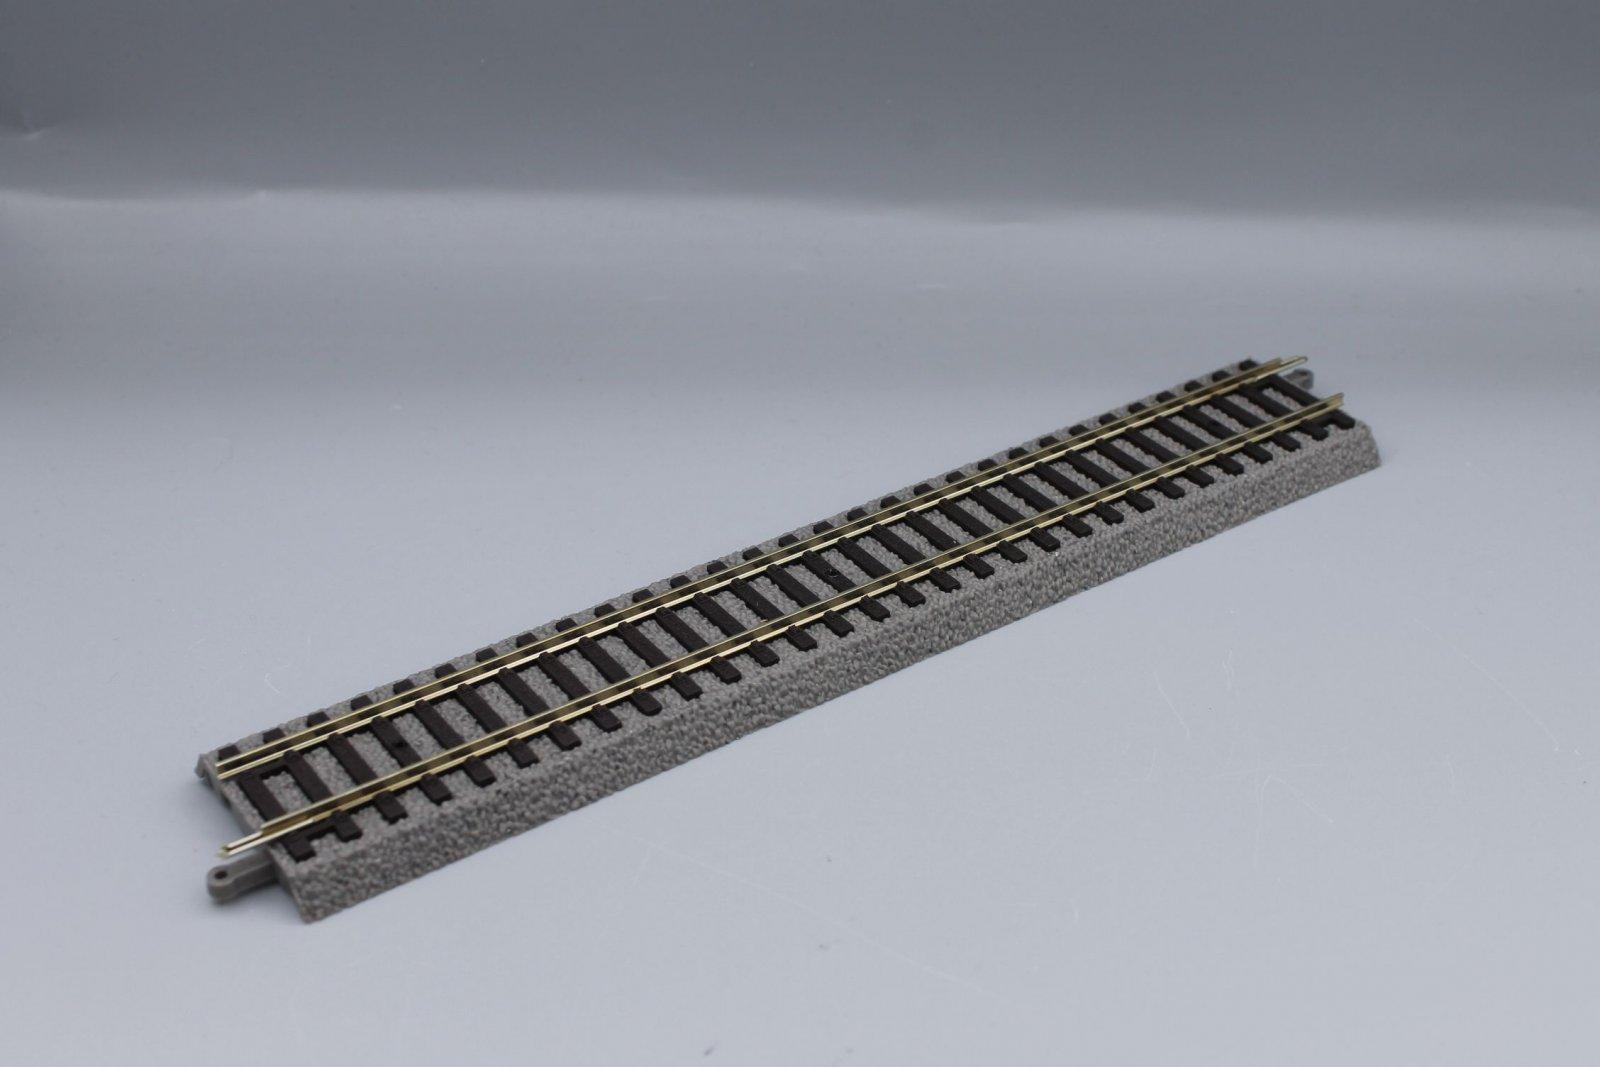 Piko 55401  A-Gleis - Gerade G231 mit Bettung - neu - 231mm